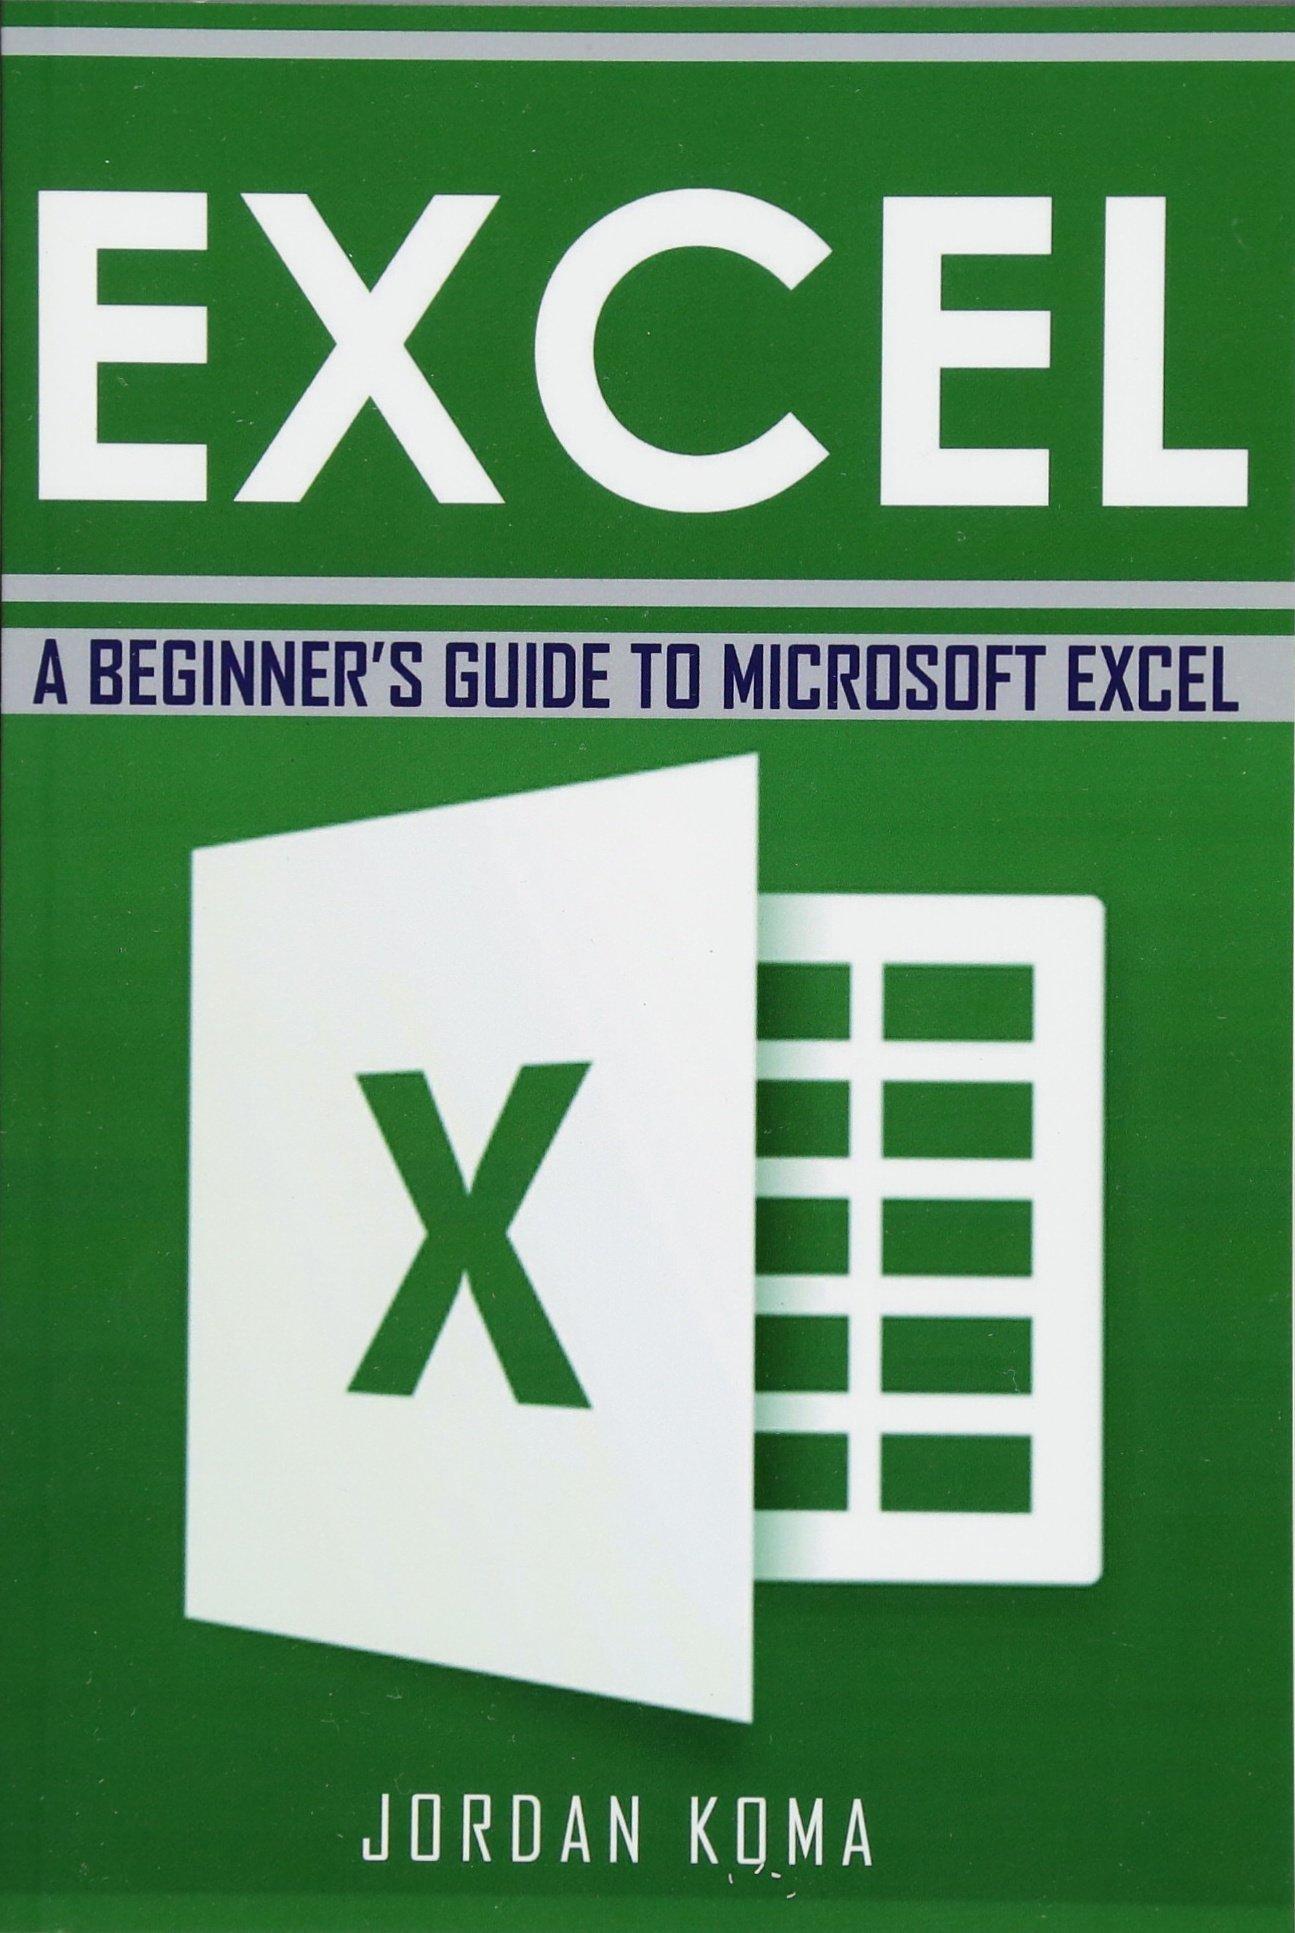 Read Online Excel: A Beginner's Guide to Microsoft Excel (Jrodan Koma's Excel Series) pdf